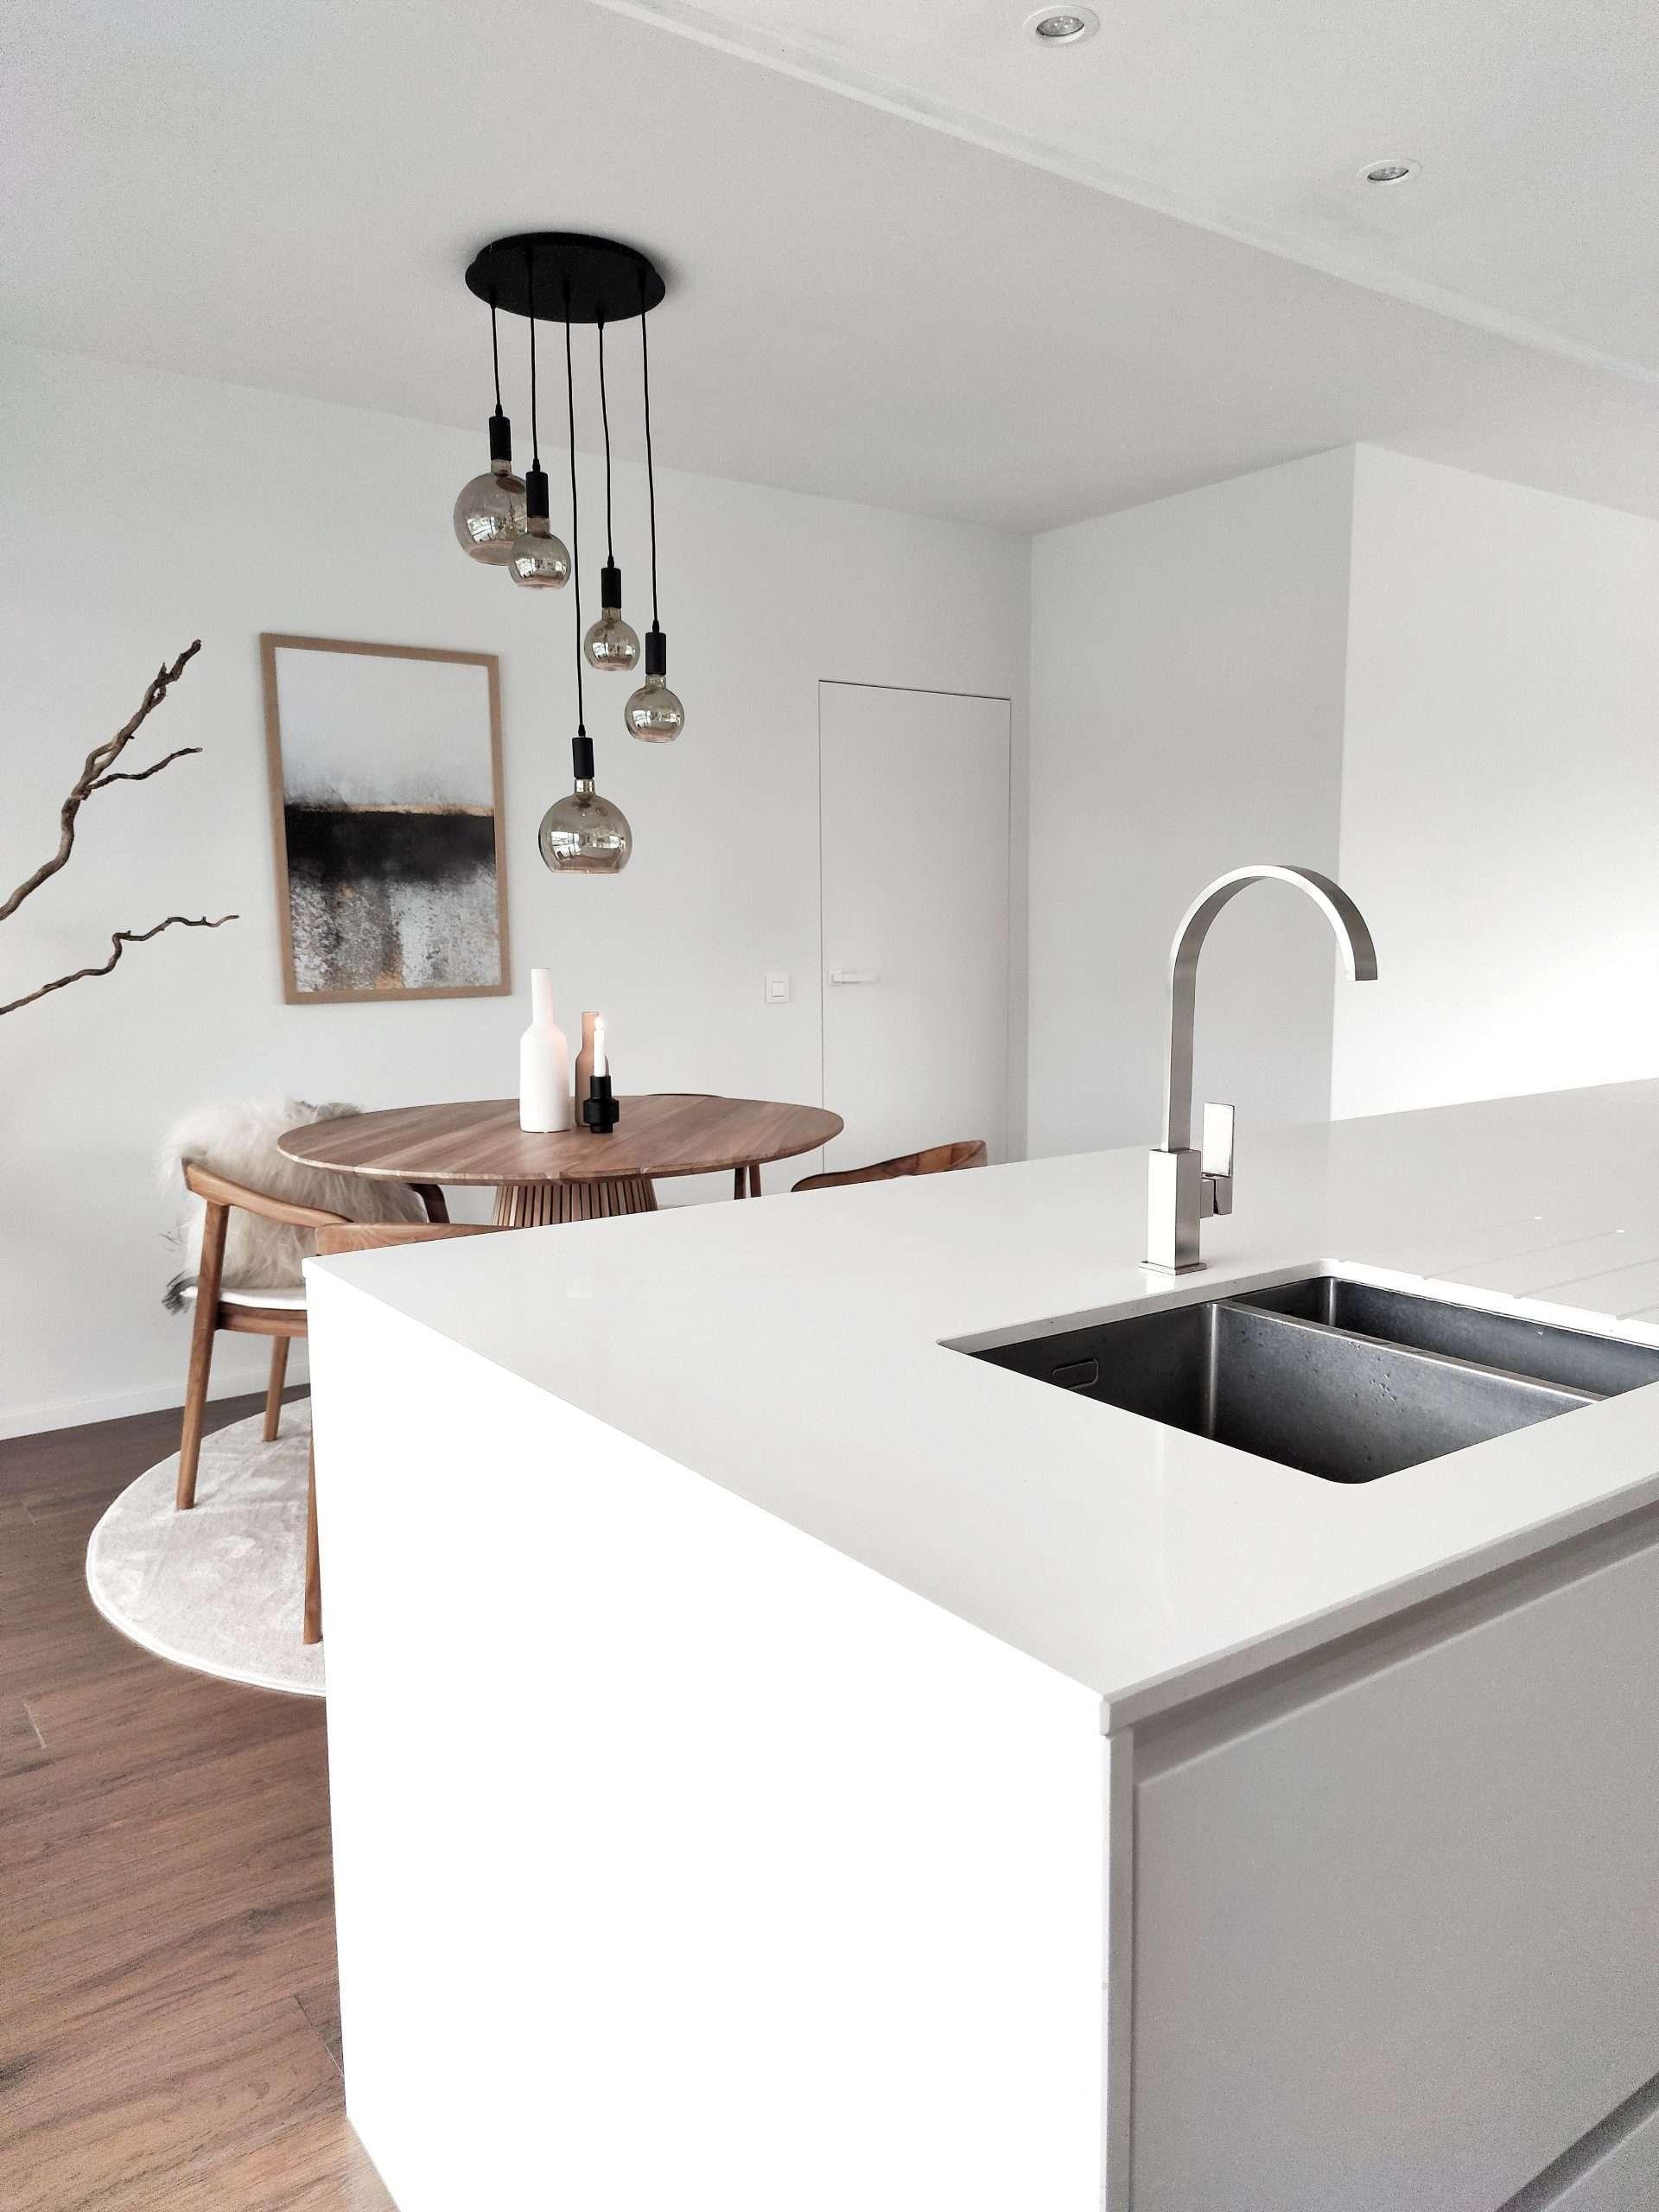 witte keuken, minimalistisch interieur, wit interieur, wonen in de regio